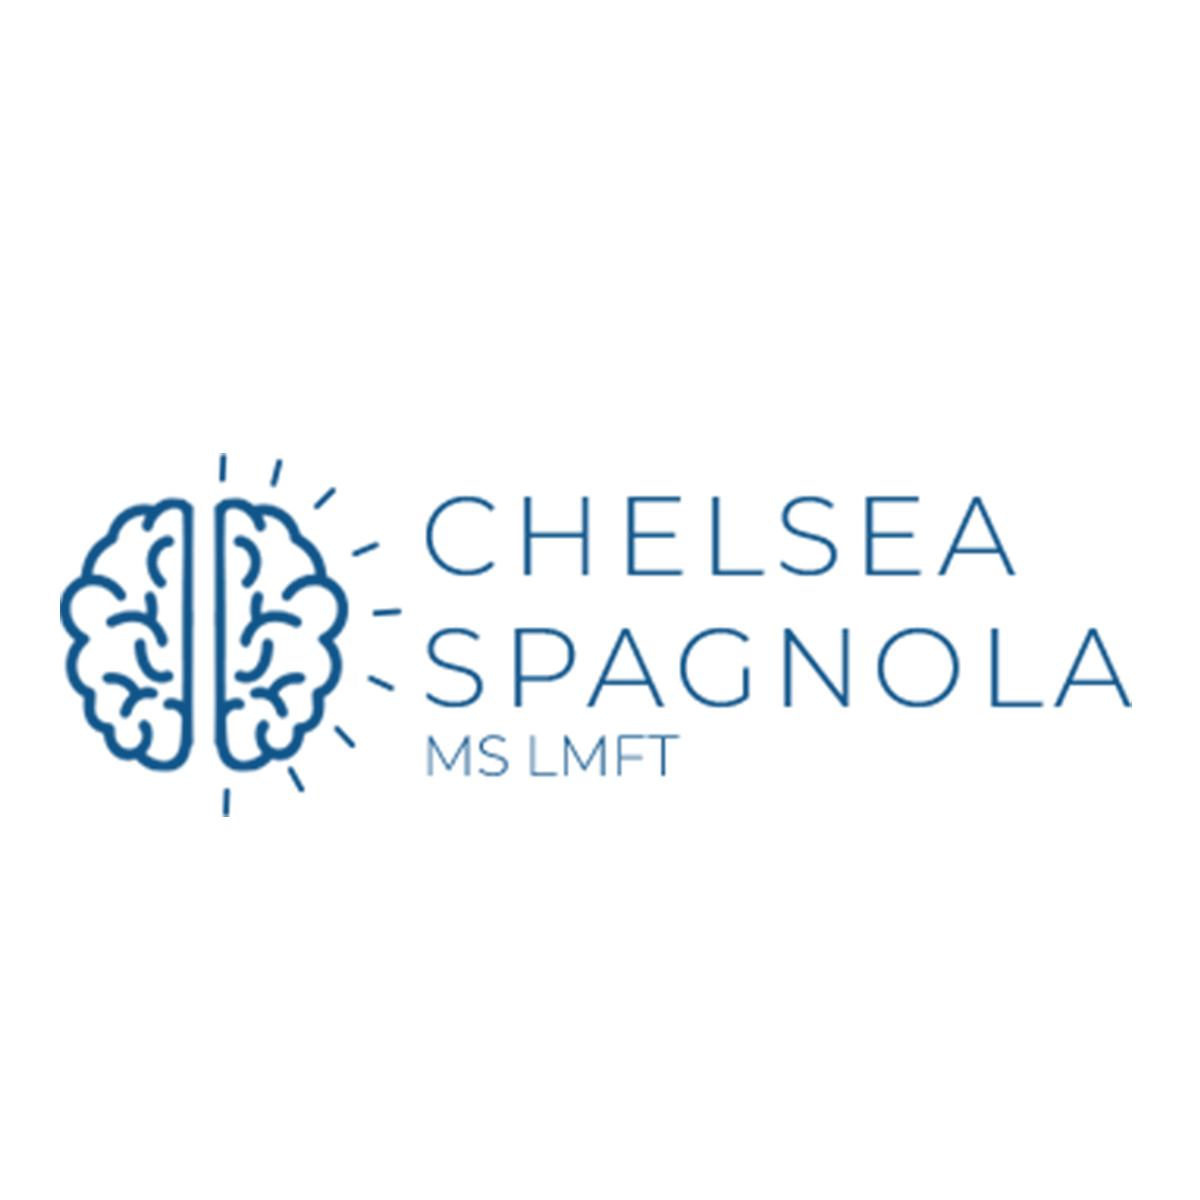 Chelsea Spagnola, MS, LMFT - Valencia, CA 91355 - (661)766-5011   ShowMeLocal.com